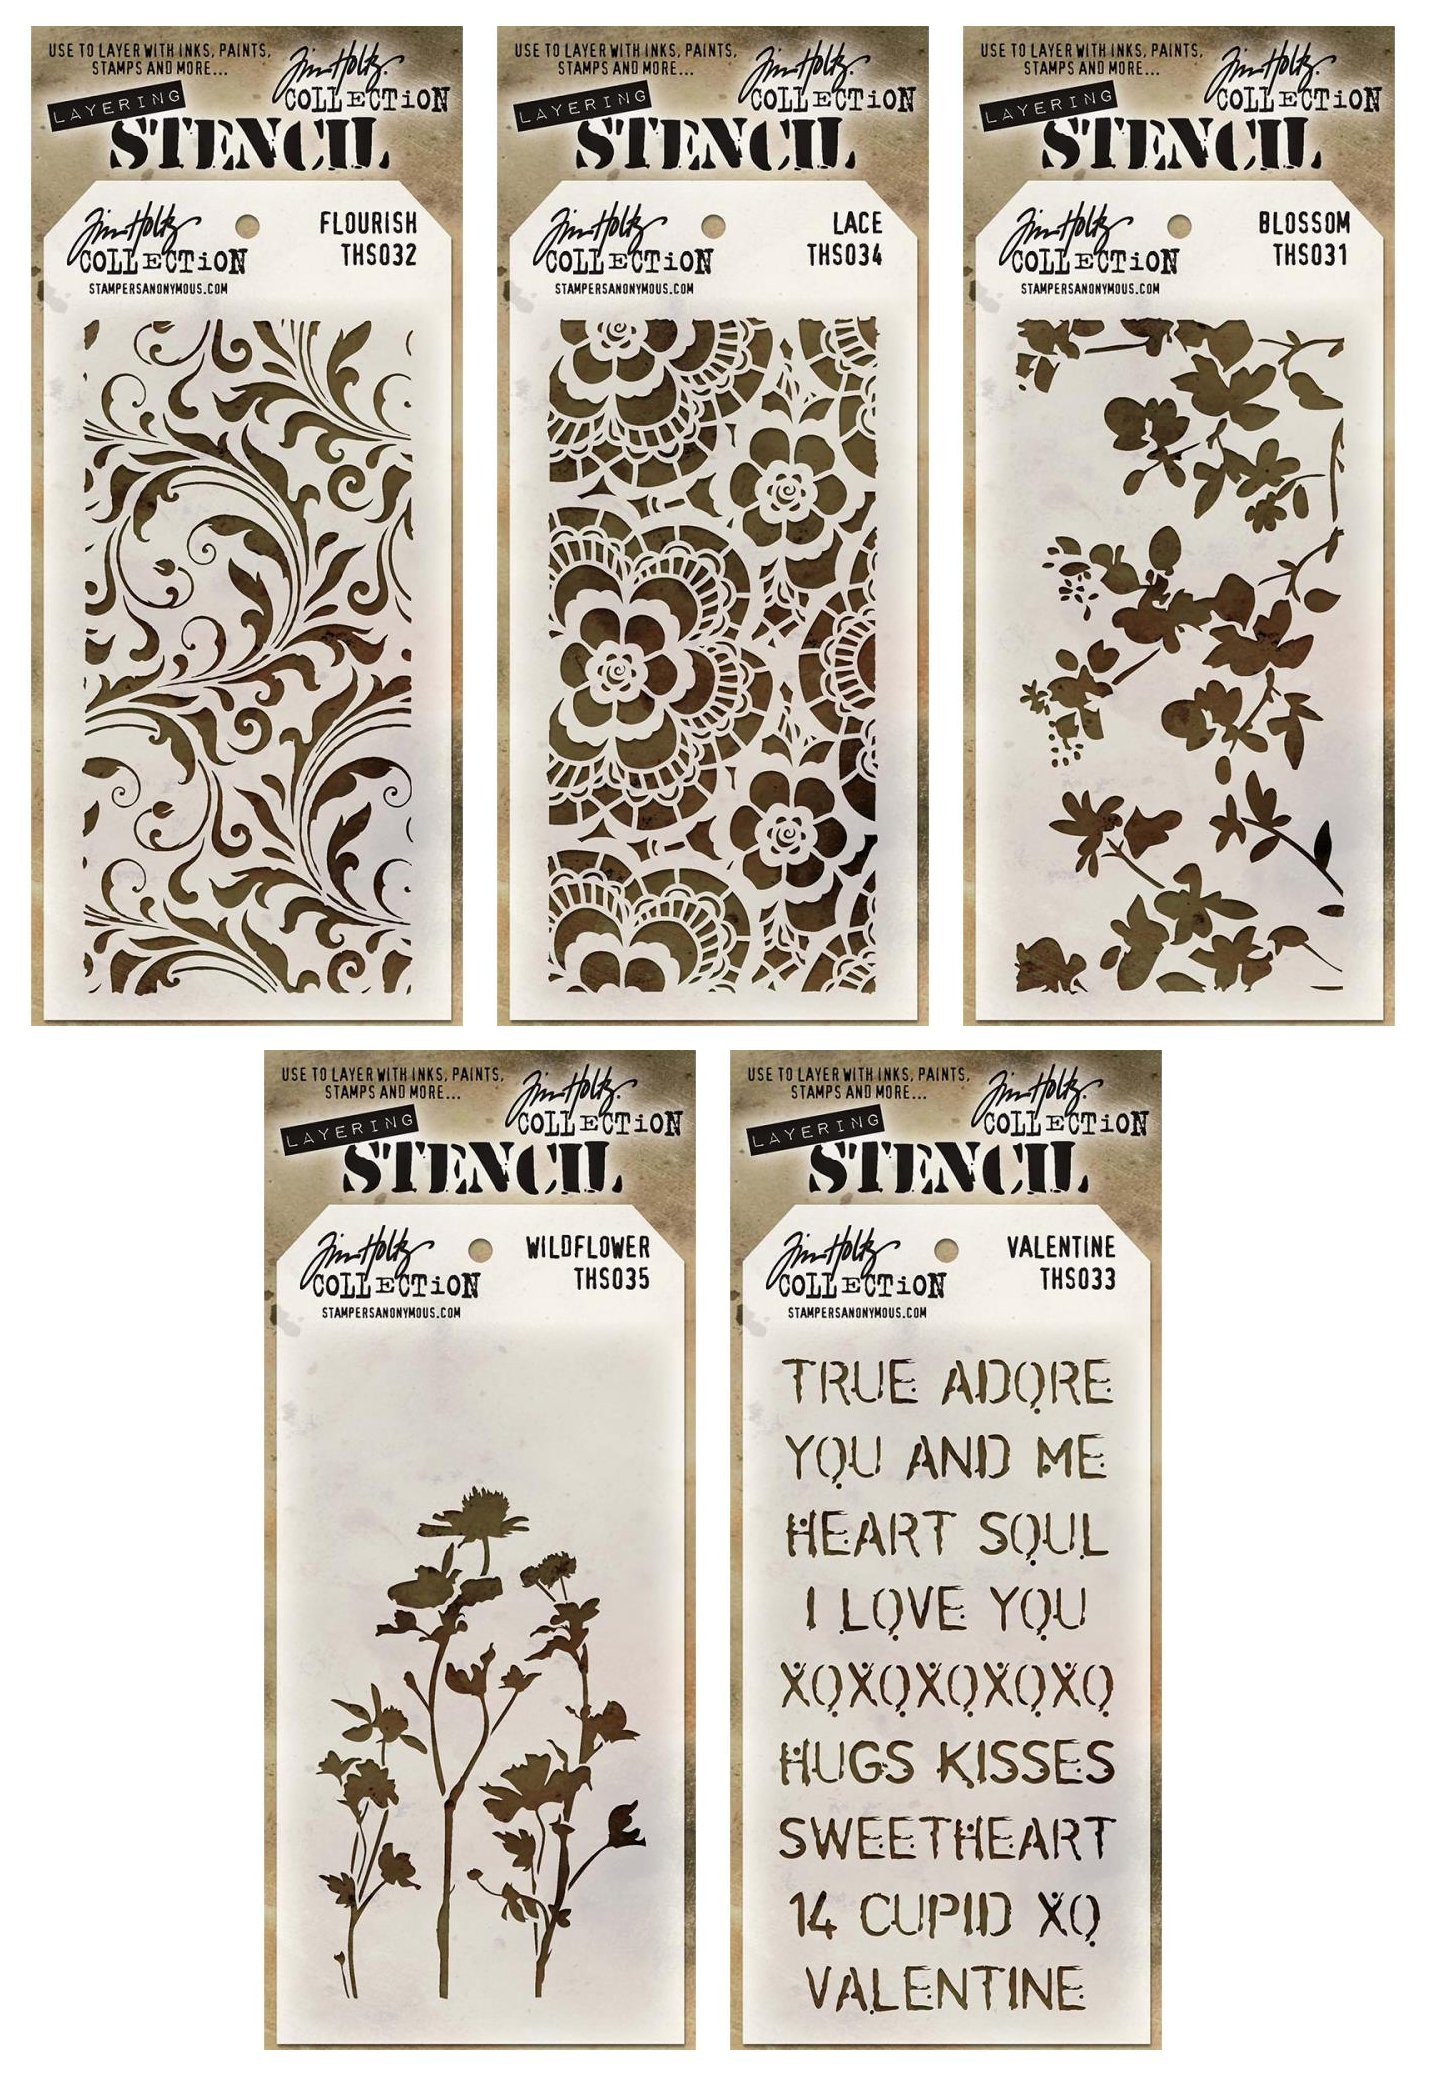 Tim Holtz - Stencils Set 1 - Five Item Bundle - Blossom, Flourish, Lace, Wildflower, and Valentine